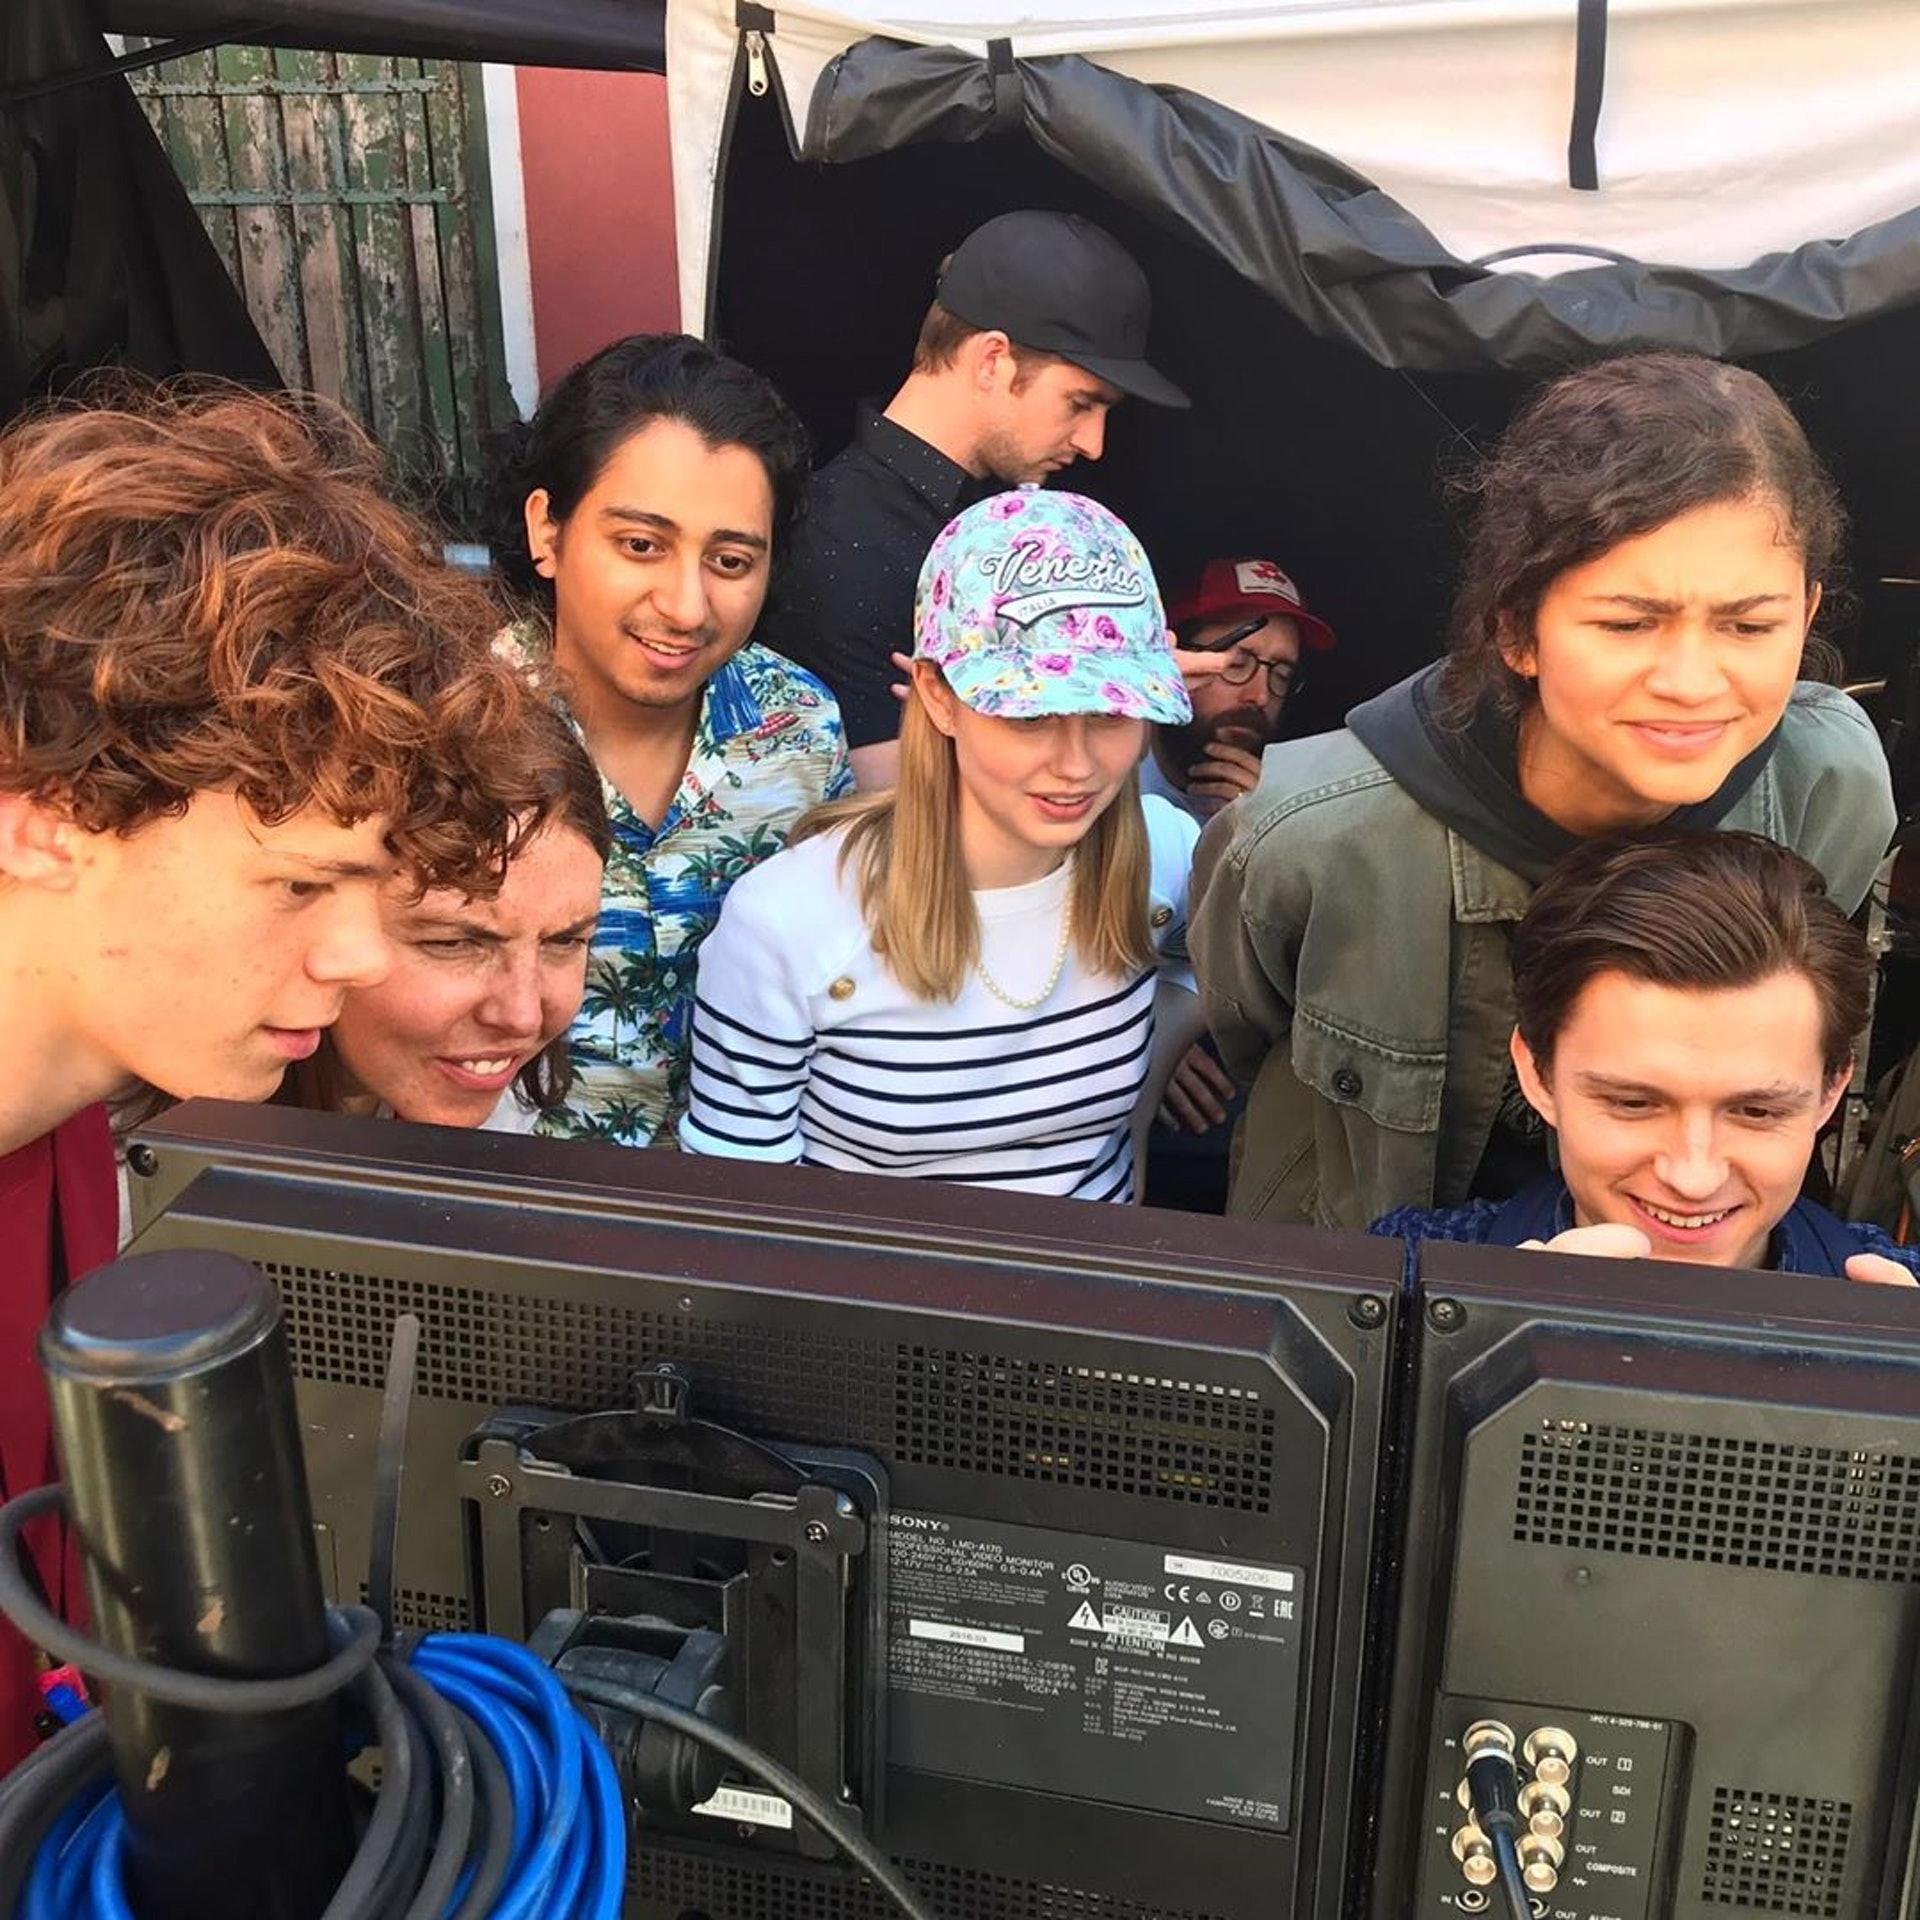 Remy表示很開心這次能參與《蜘蛛俠:決戰千里》,也因此認識了一班好友。(Jon Watts/IG相片)